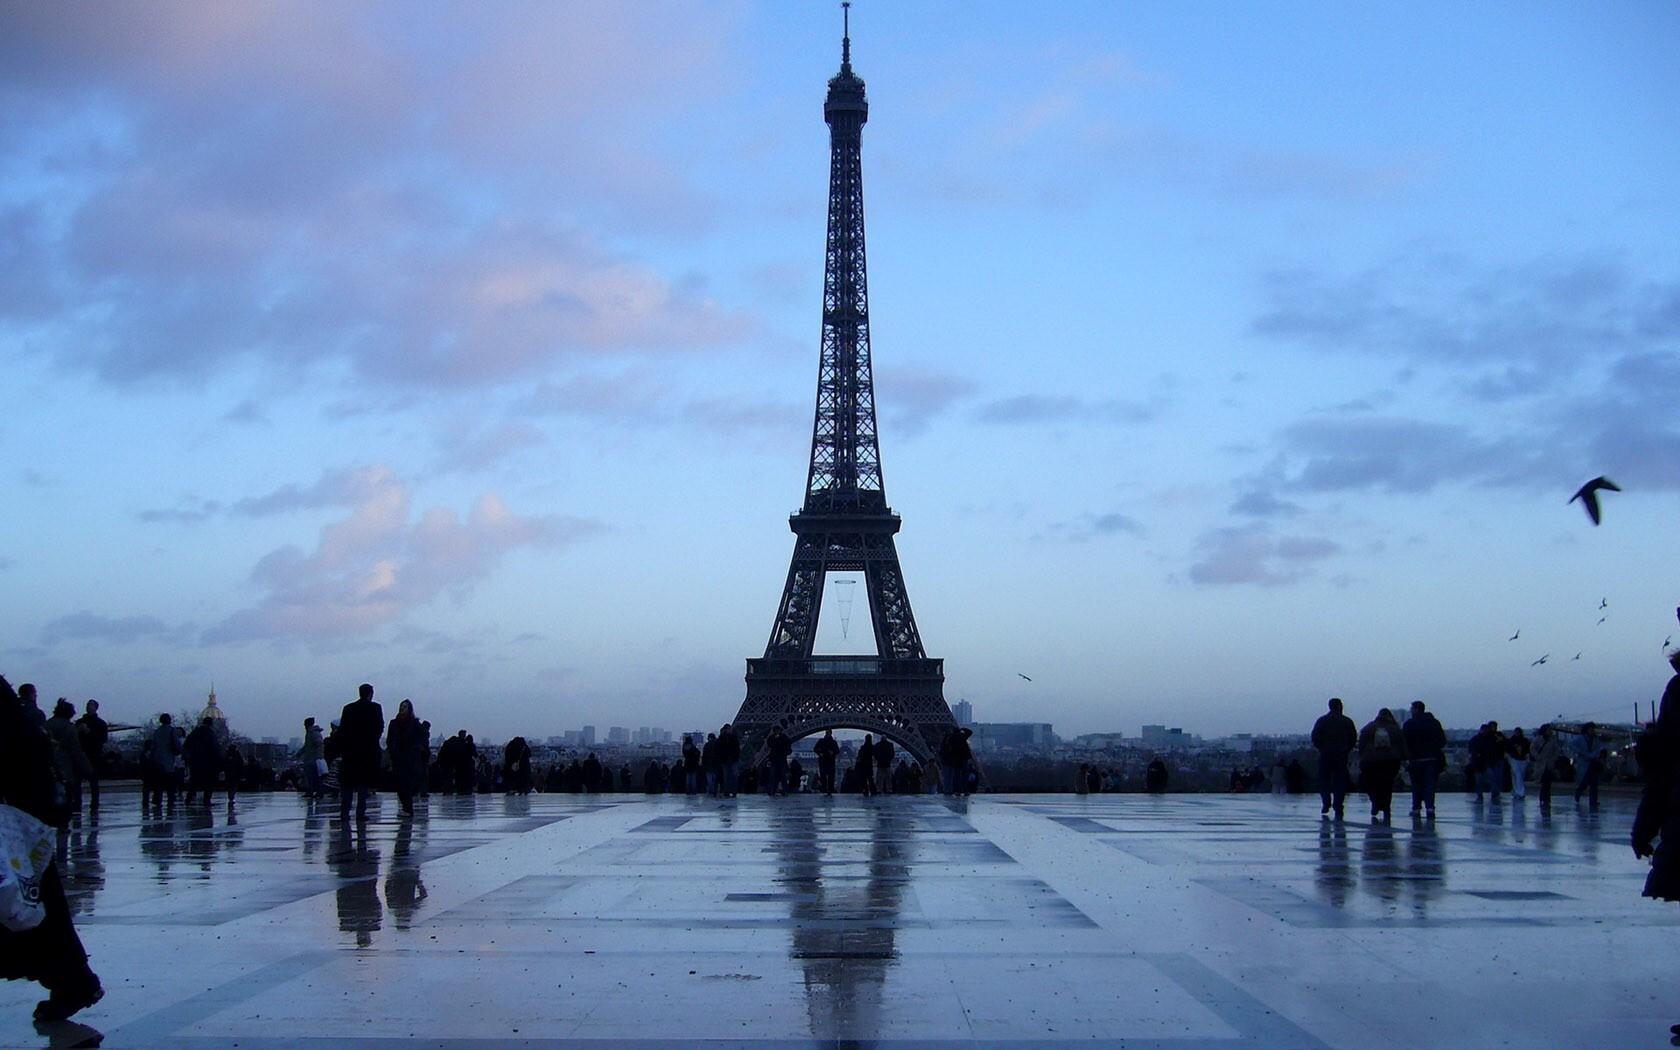 eiffel tower in paris france wallpaper download | hd wallpapers